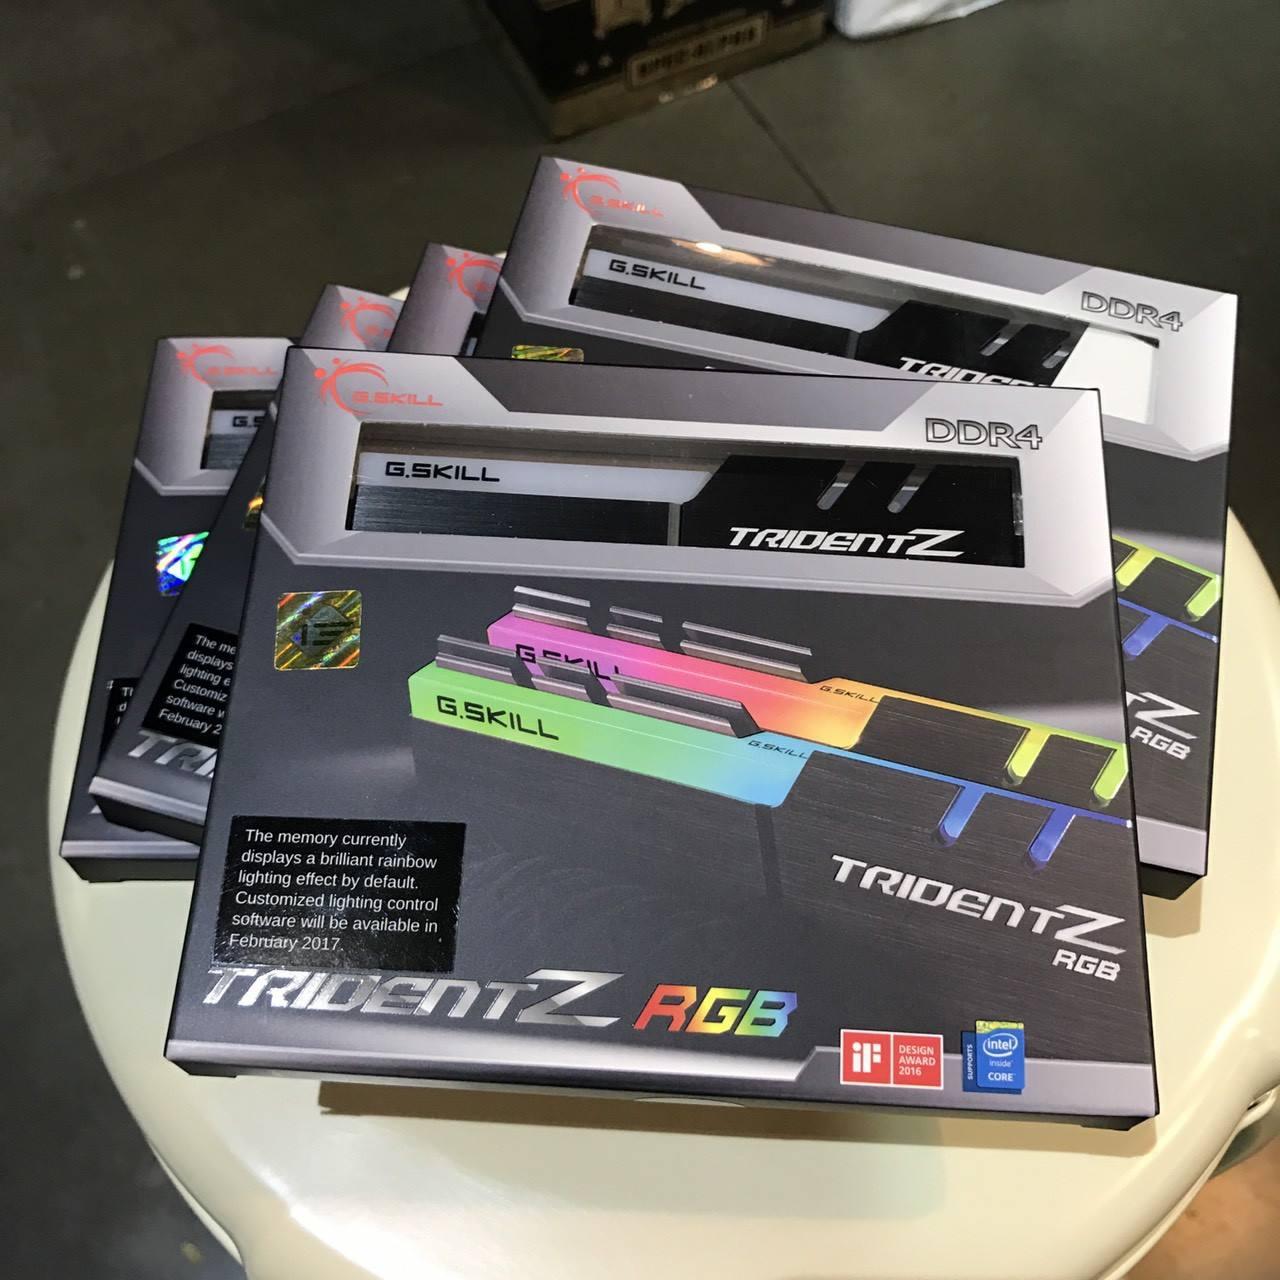 16179797 1334337779922107 7014558488982325535 o G.Skill Trident Z DDR4 16GB 3000MHz (8GB x2) สุดแรงพร้อมสีสรรแบบจัดเต็มด้วย RGB วางจำหน่ายแล้วในไทย